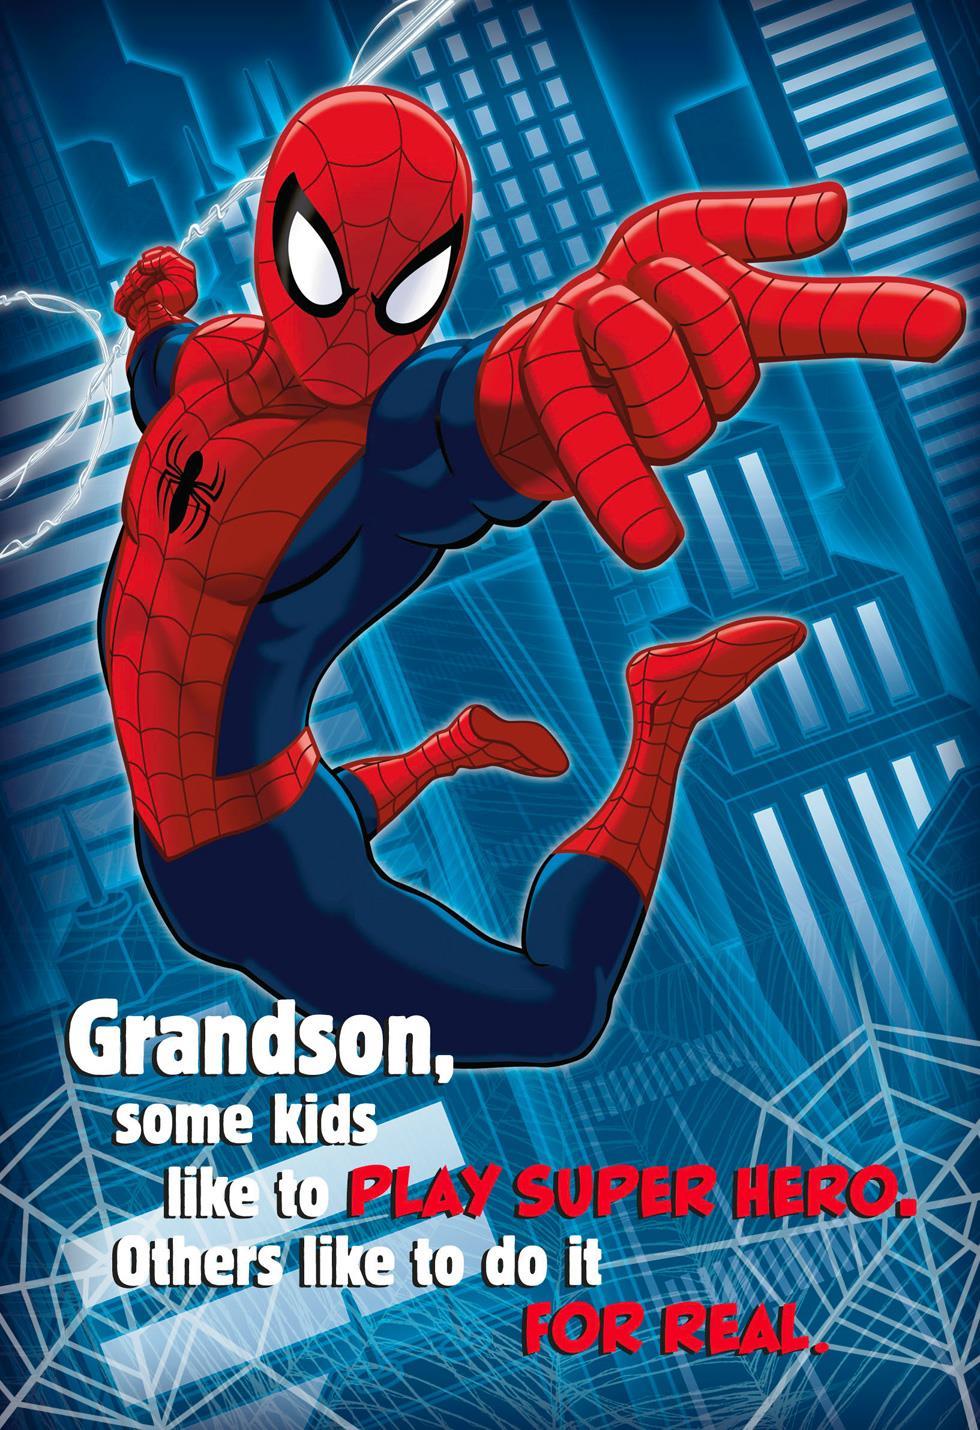 Spider man true hero musical birthday card for grandson greeting spider man true hero musical birthday card for grandson bookmarktalkfo Gallery